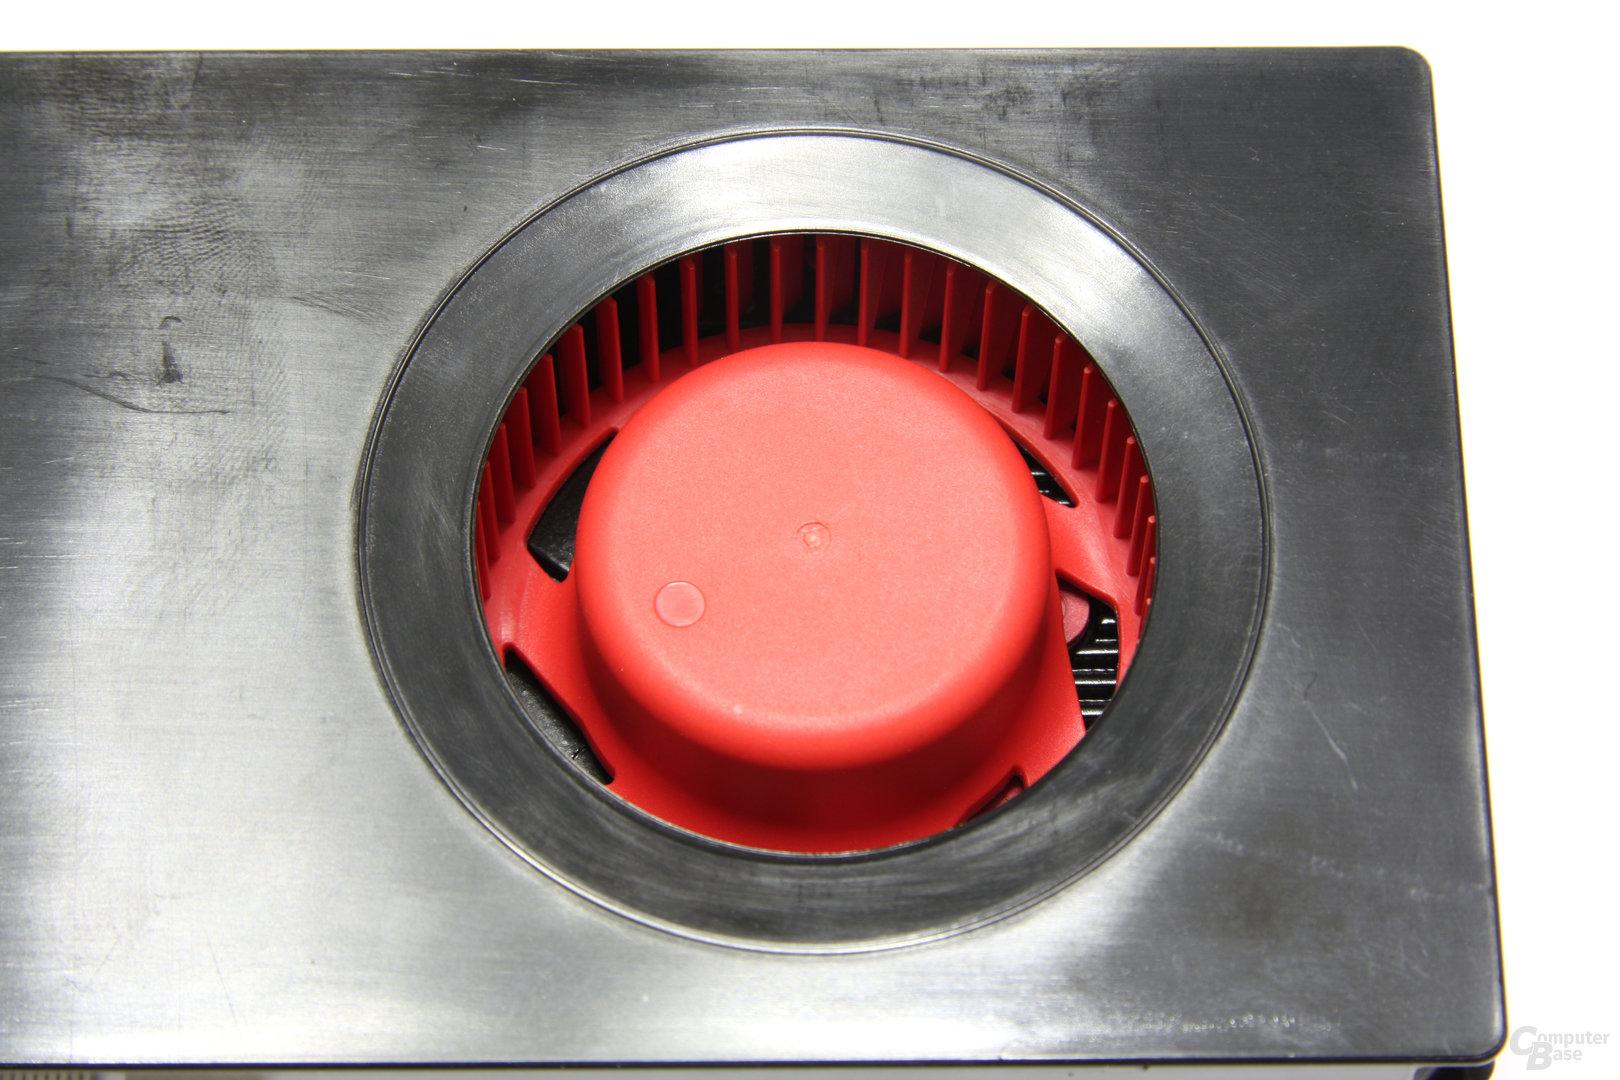 Radeon HD 6790 Lüfter